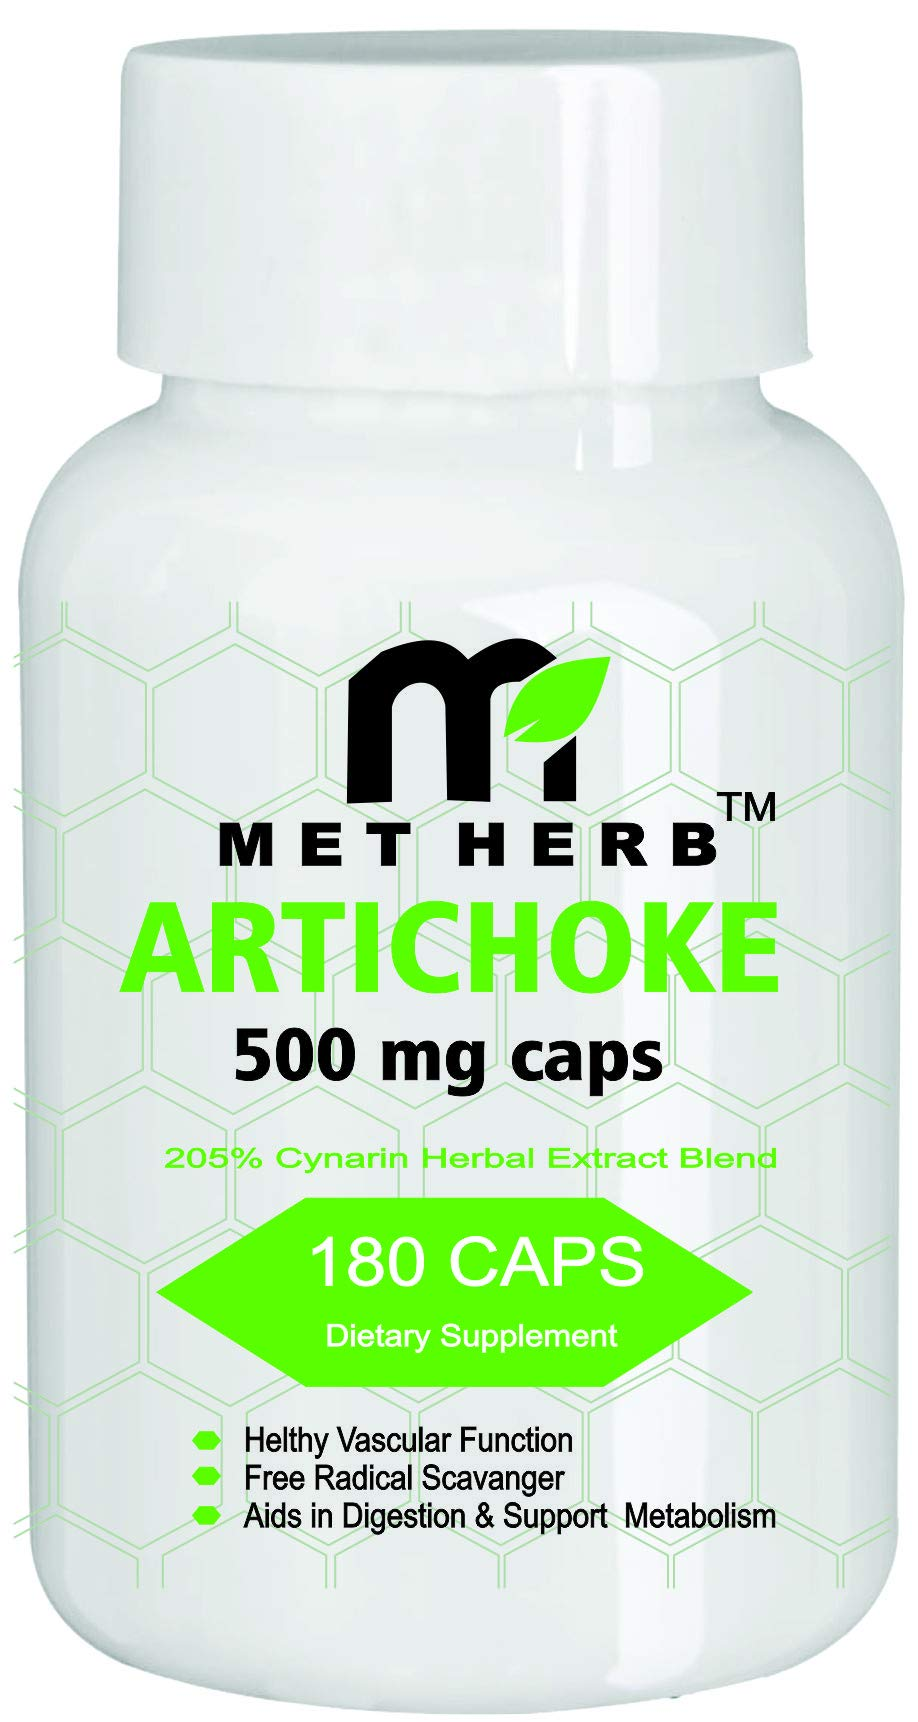 Artichoke Leaf Extract 500mg Veg Capsules Digestive Cardiovascular Support -180 Capsules